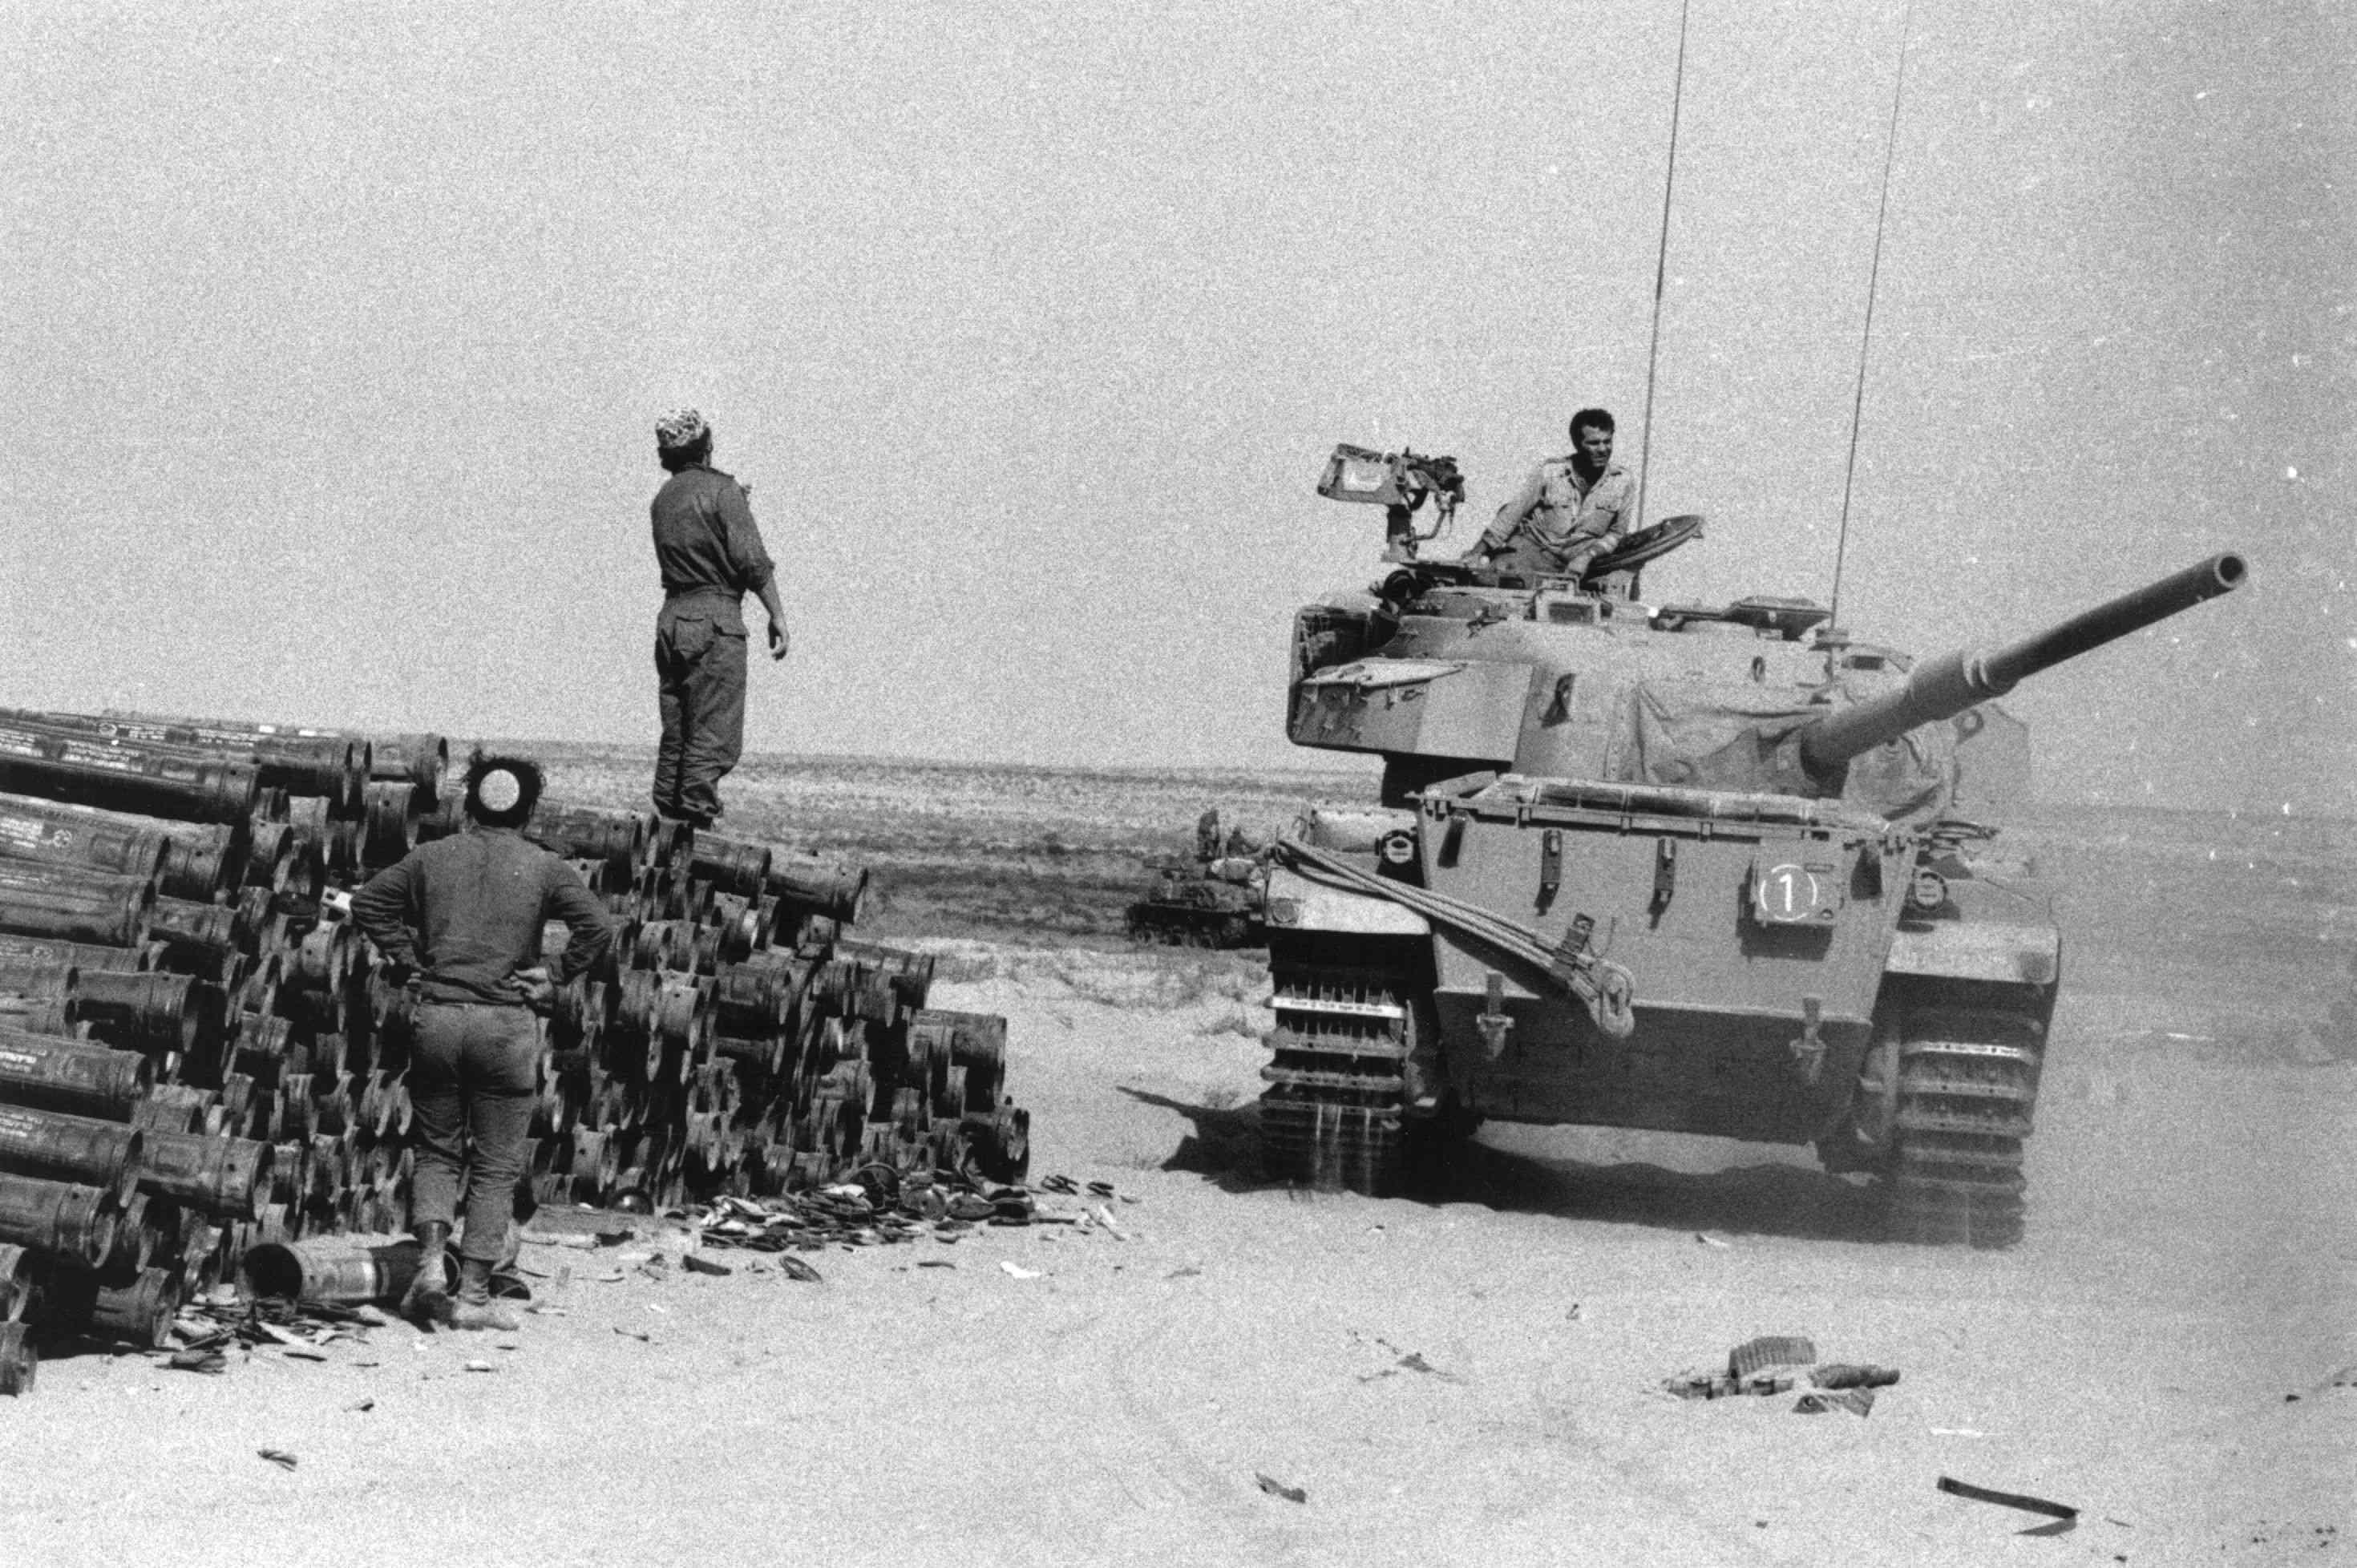 Israeli tank at supply depot in the Sinai, 1973.